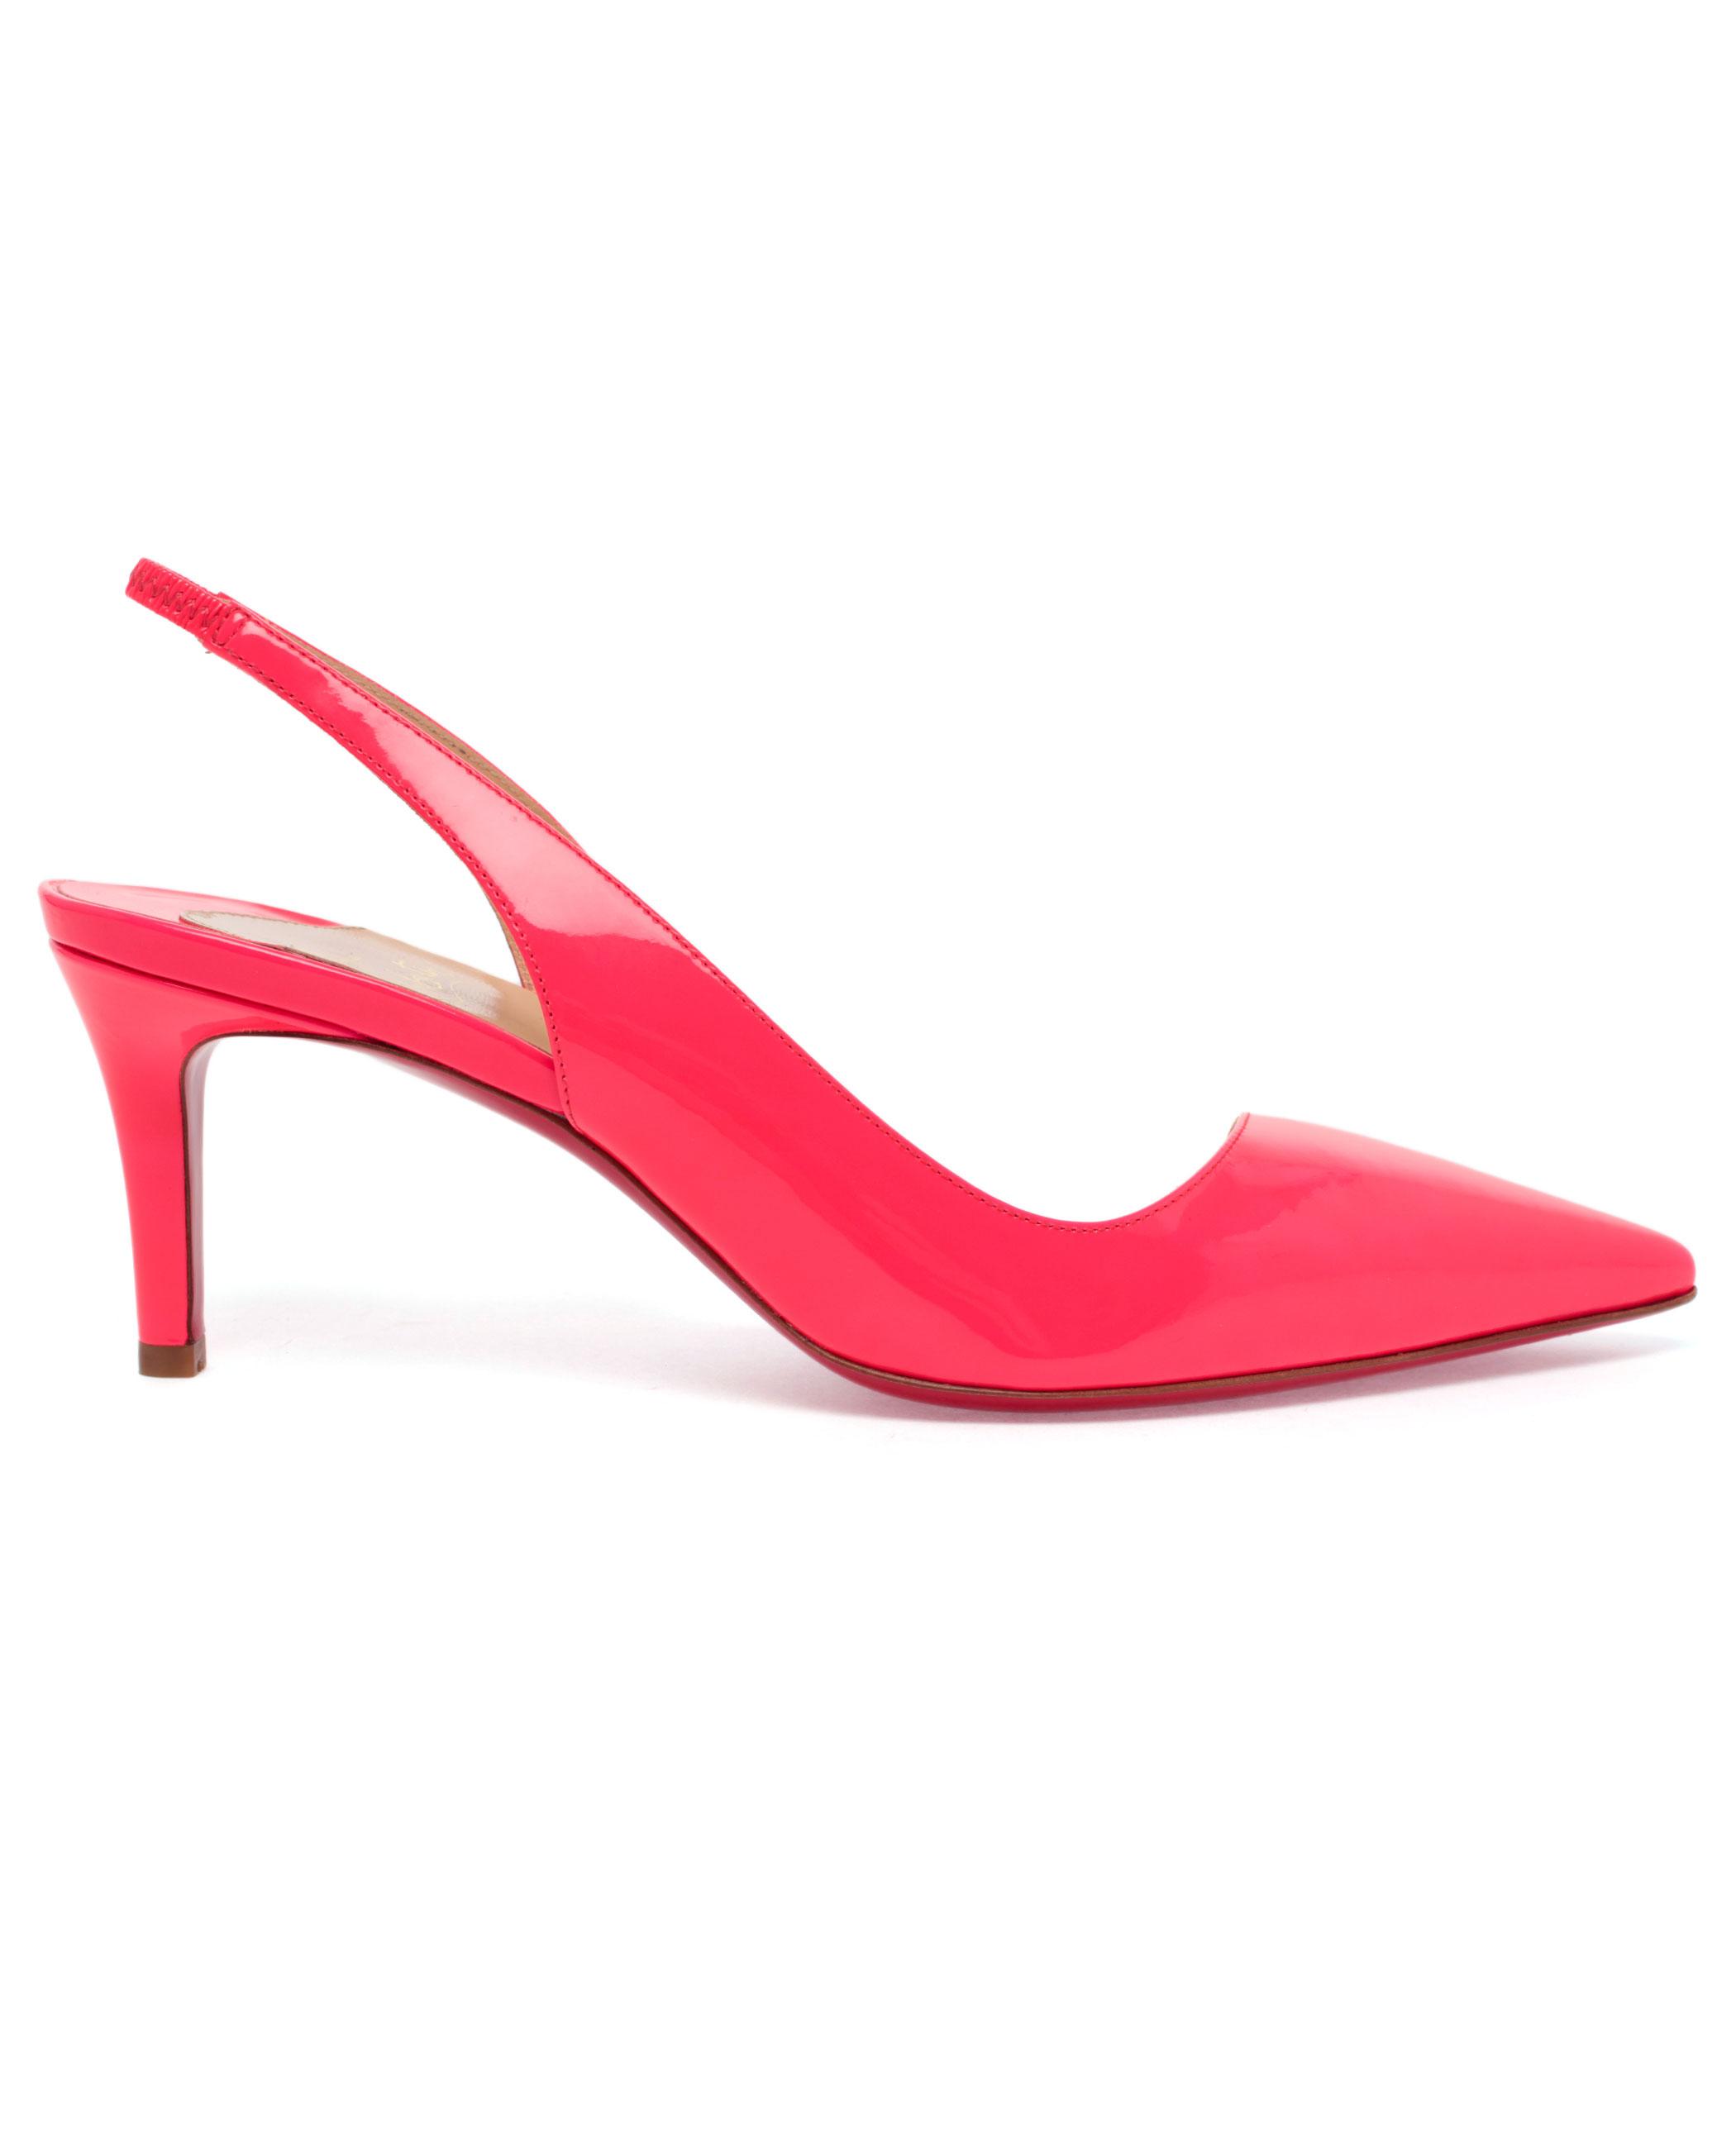 christian-louboutin-miss-penniman-patent-leather-pumps-product-2-8315372-968450036.jpeg